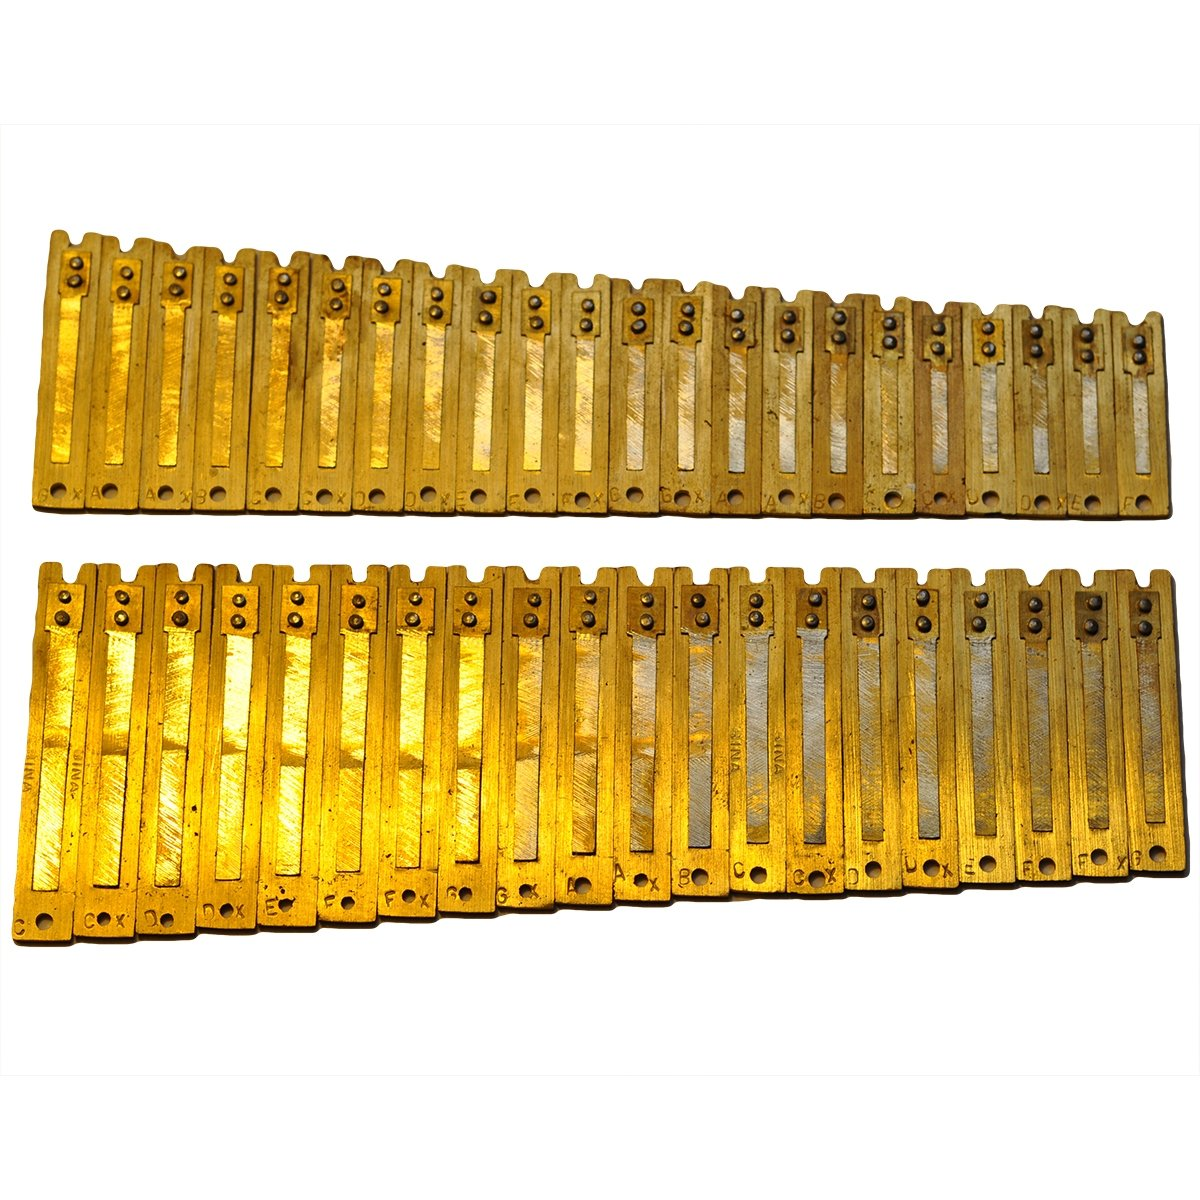 Harmonium Reeds - 3.5 Octave Bass Set for Delhi harmoniums BHAVA Harmonium Co. Punjabi Bass Reeds